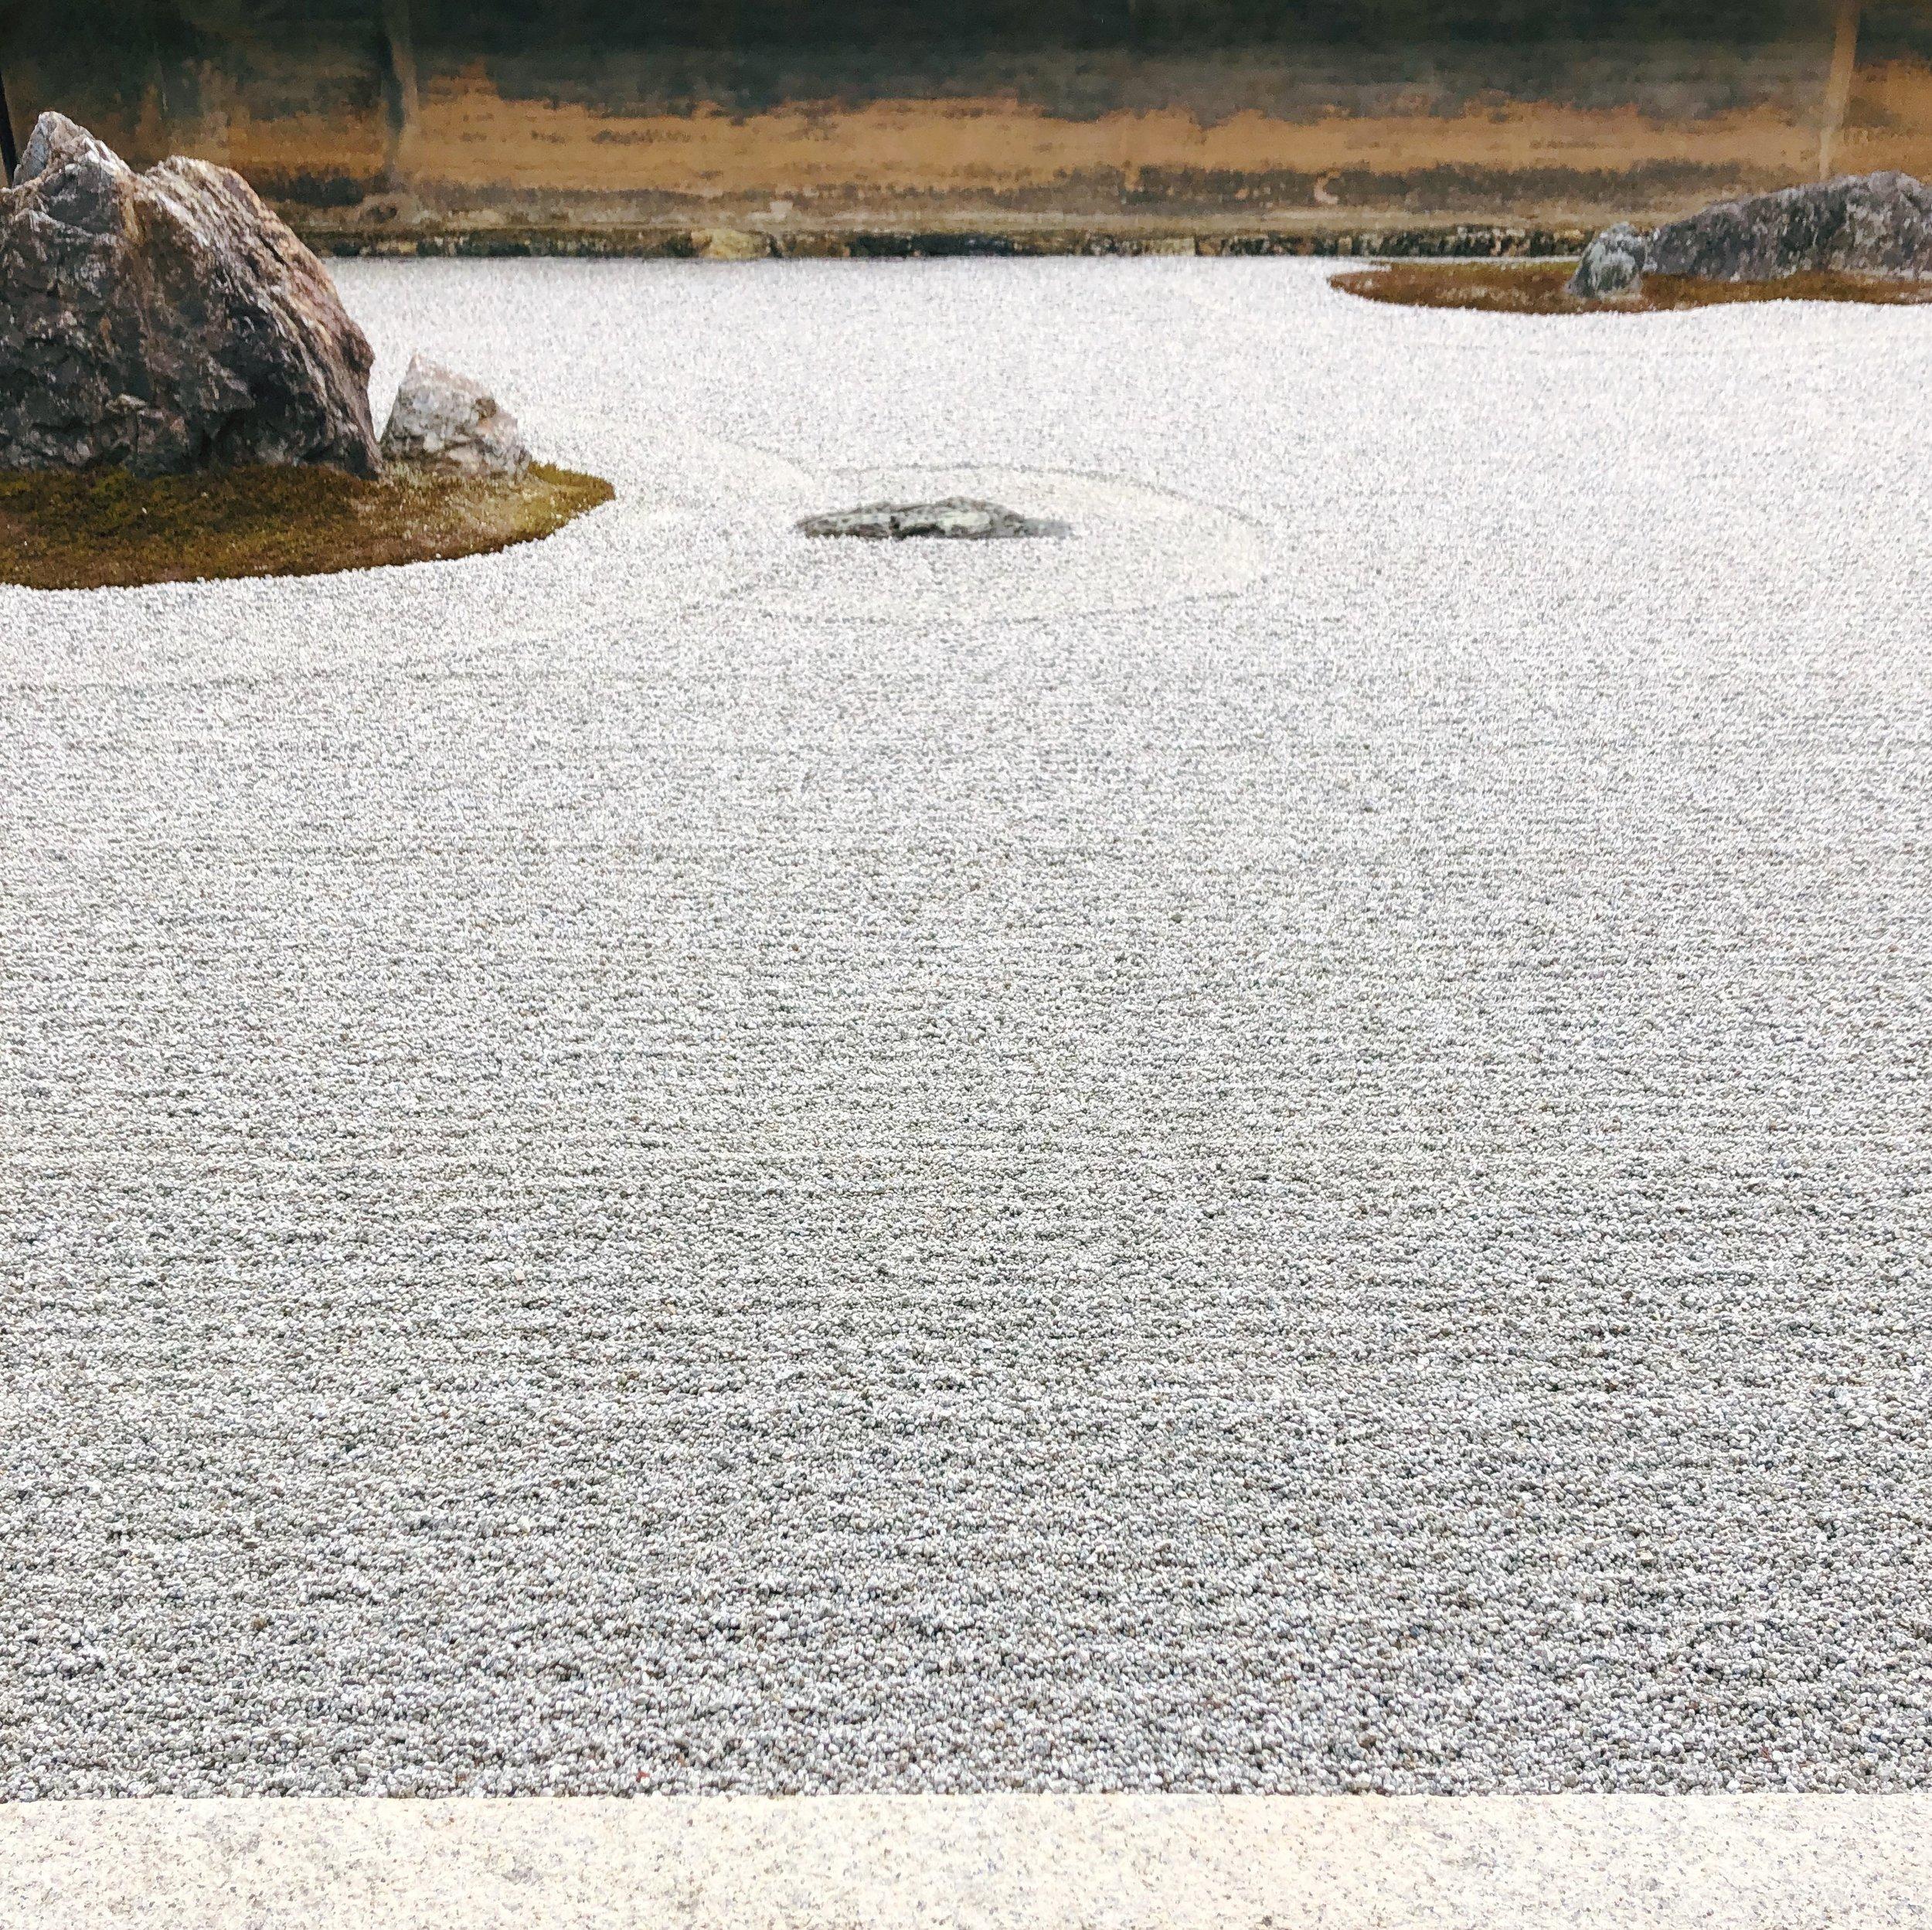 Pure serenity, Kyoto.